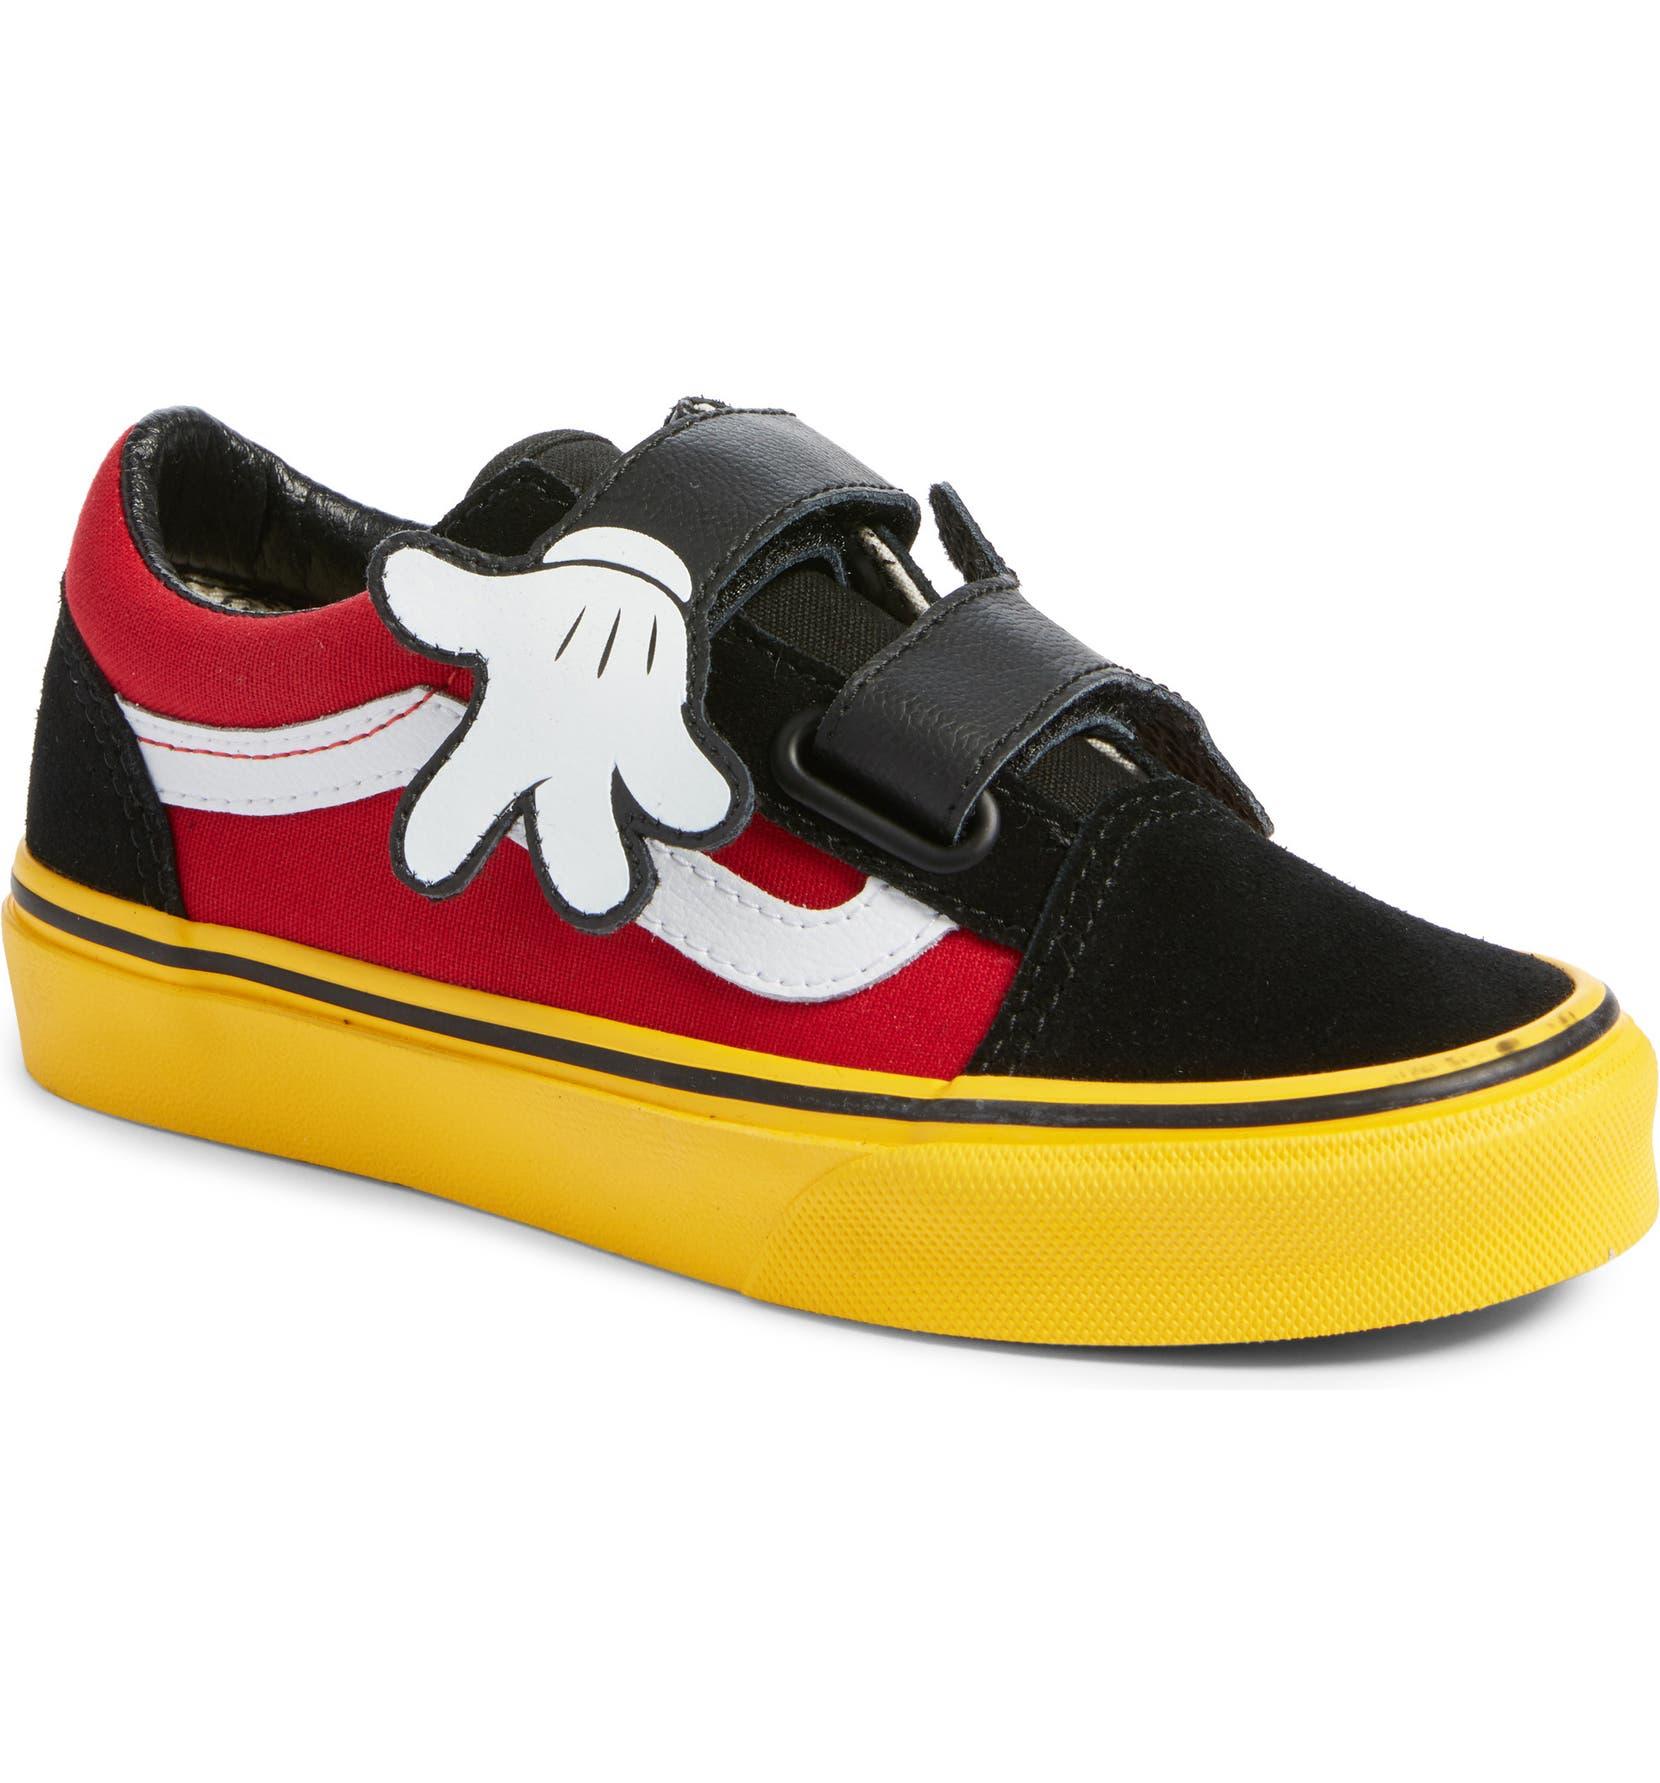 5d3c3d1b2fe950 Vans x Disney Mickey Mouse Old Skool V Sneaker (Baby